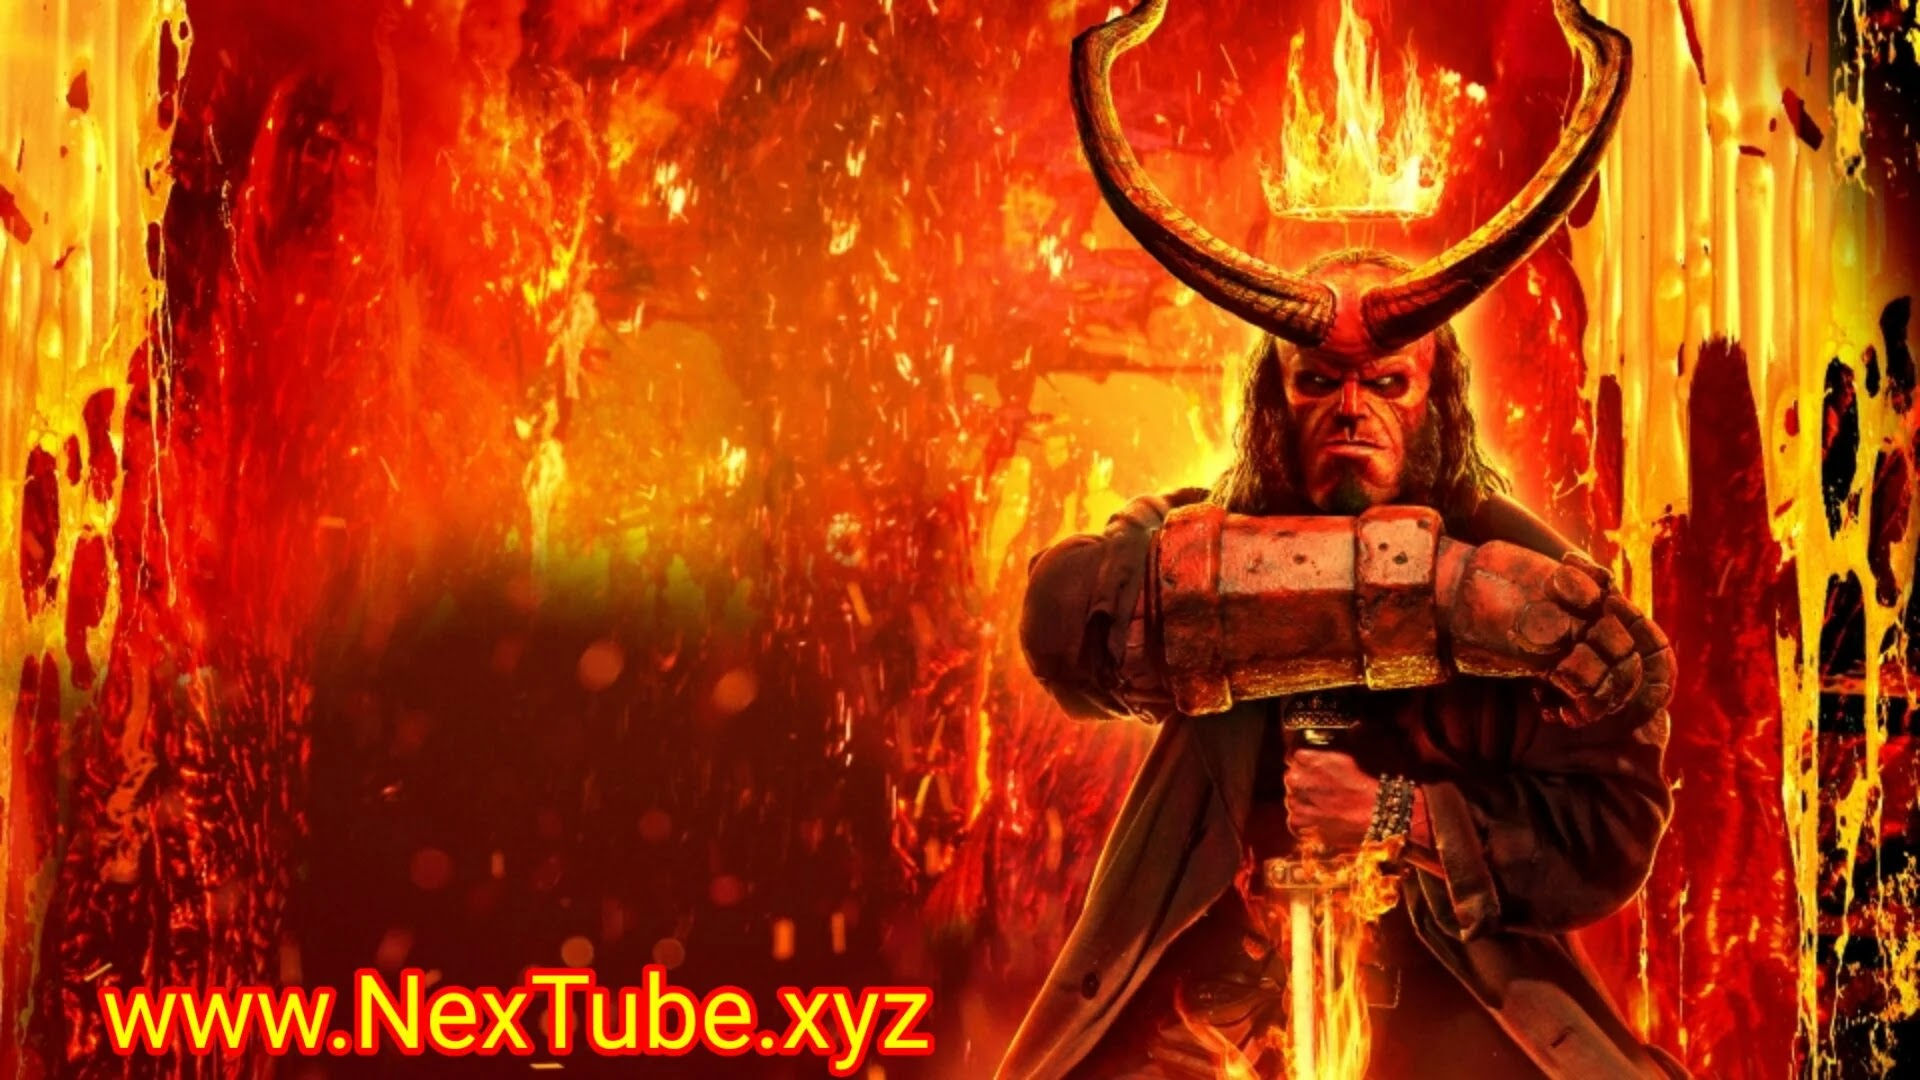 Hellboy 2019 full movie Free